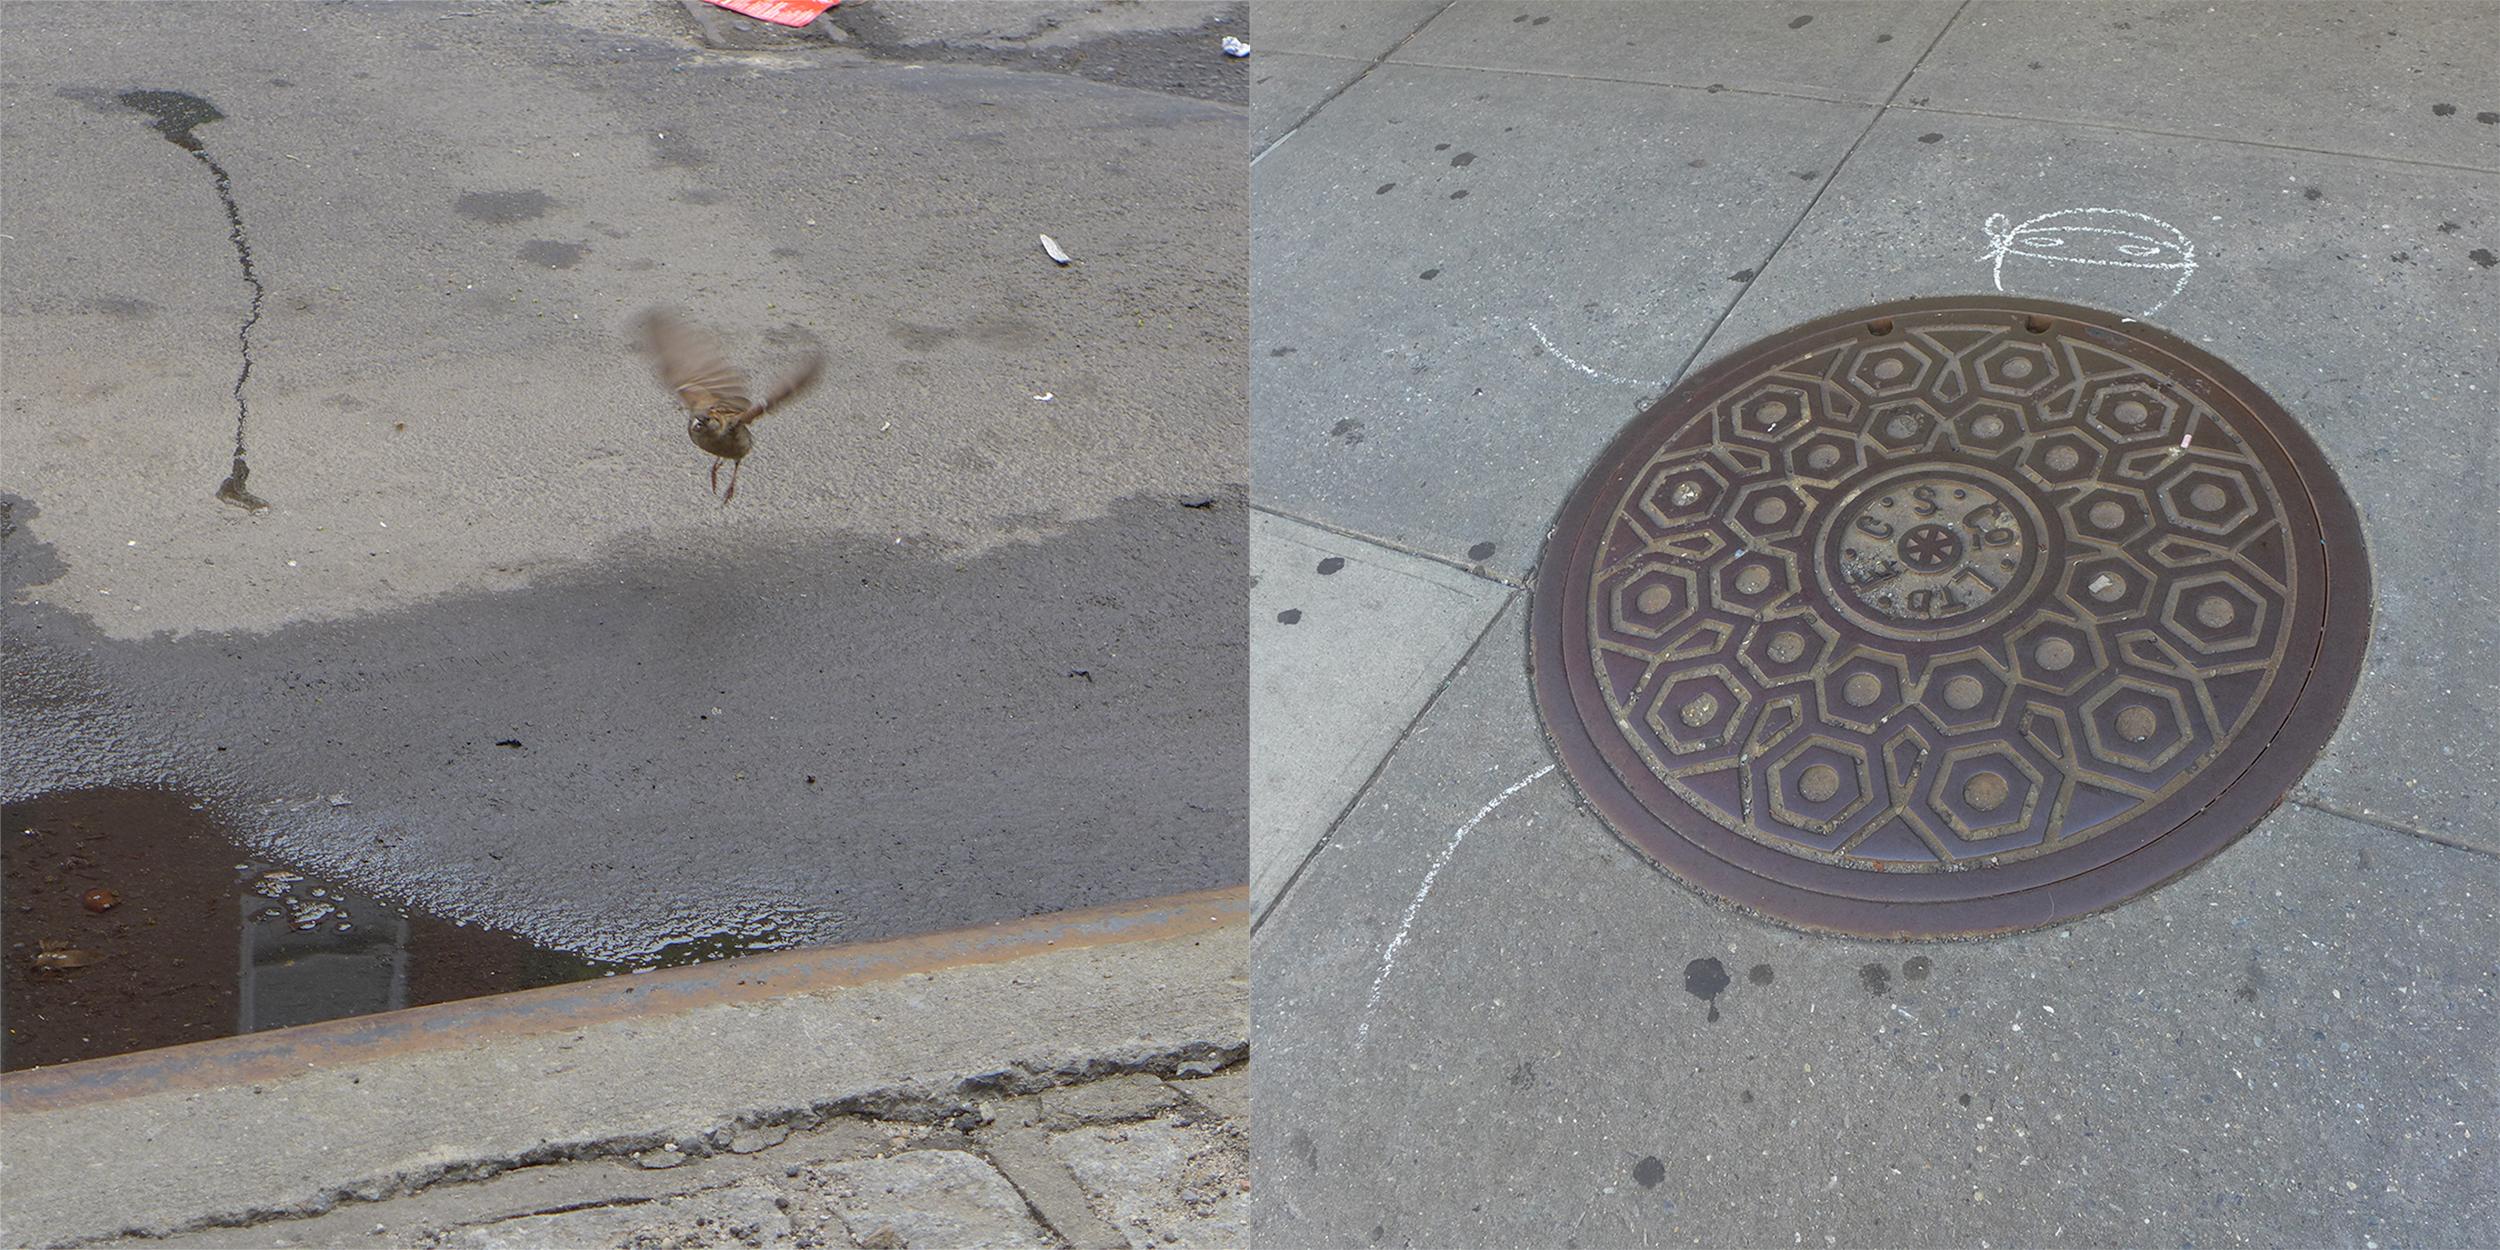 Bird Hovering/Manhole Turtle